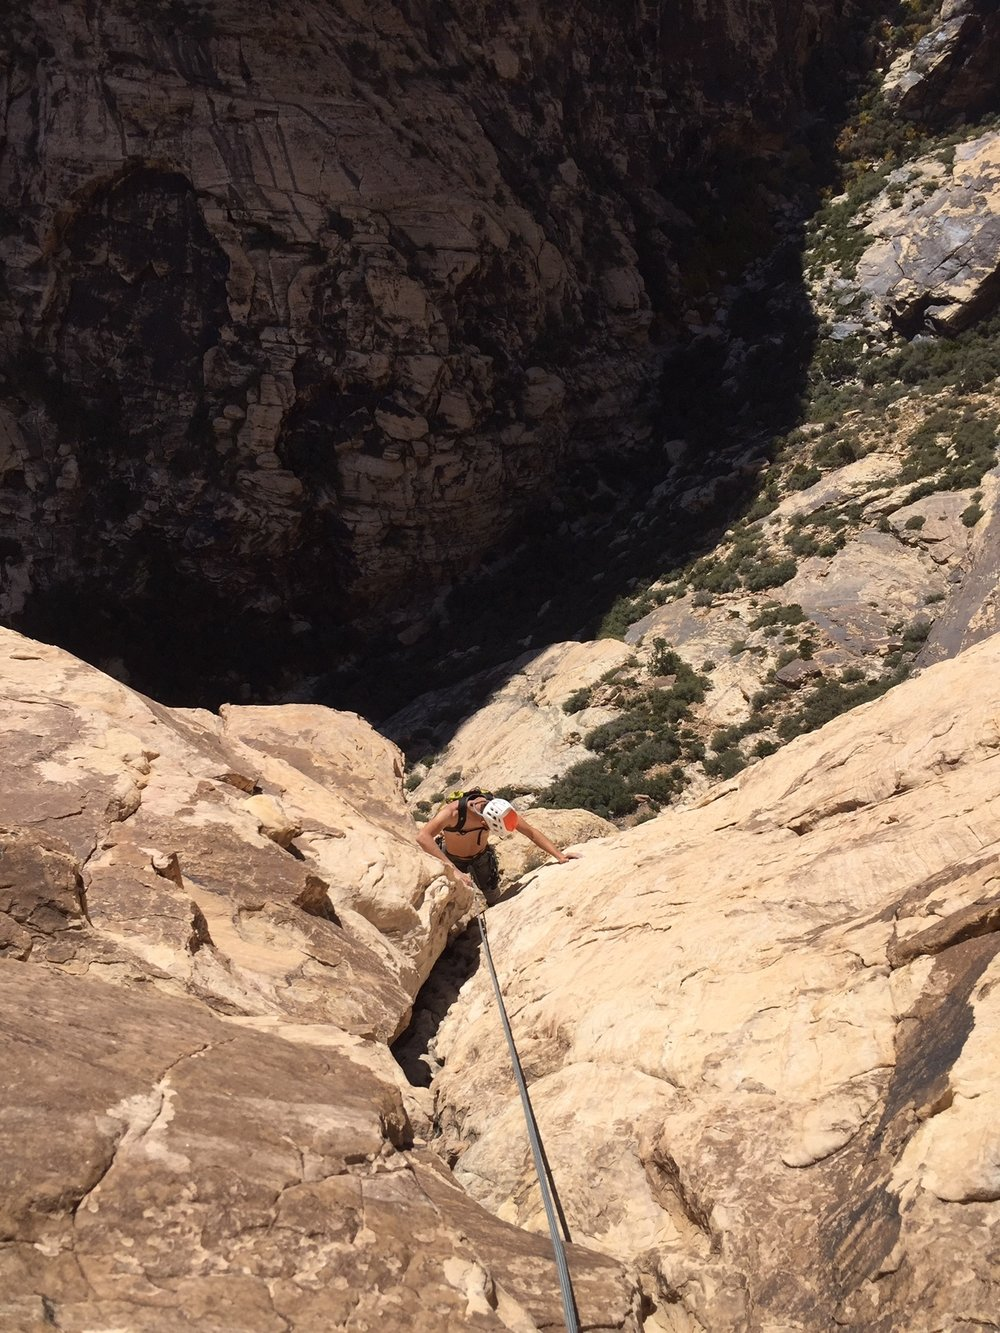 Red Rock Nevada 3 Alpine Climber Rock Climbing SAANO Adventures Trad Climbing Multi Pitch.JPG